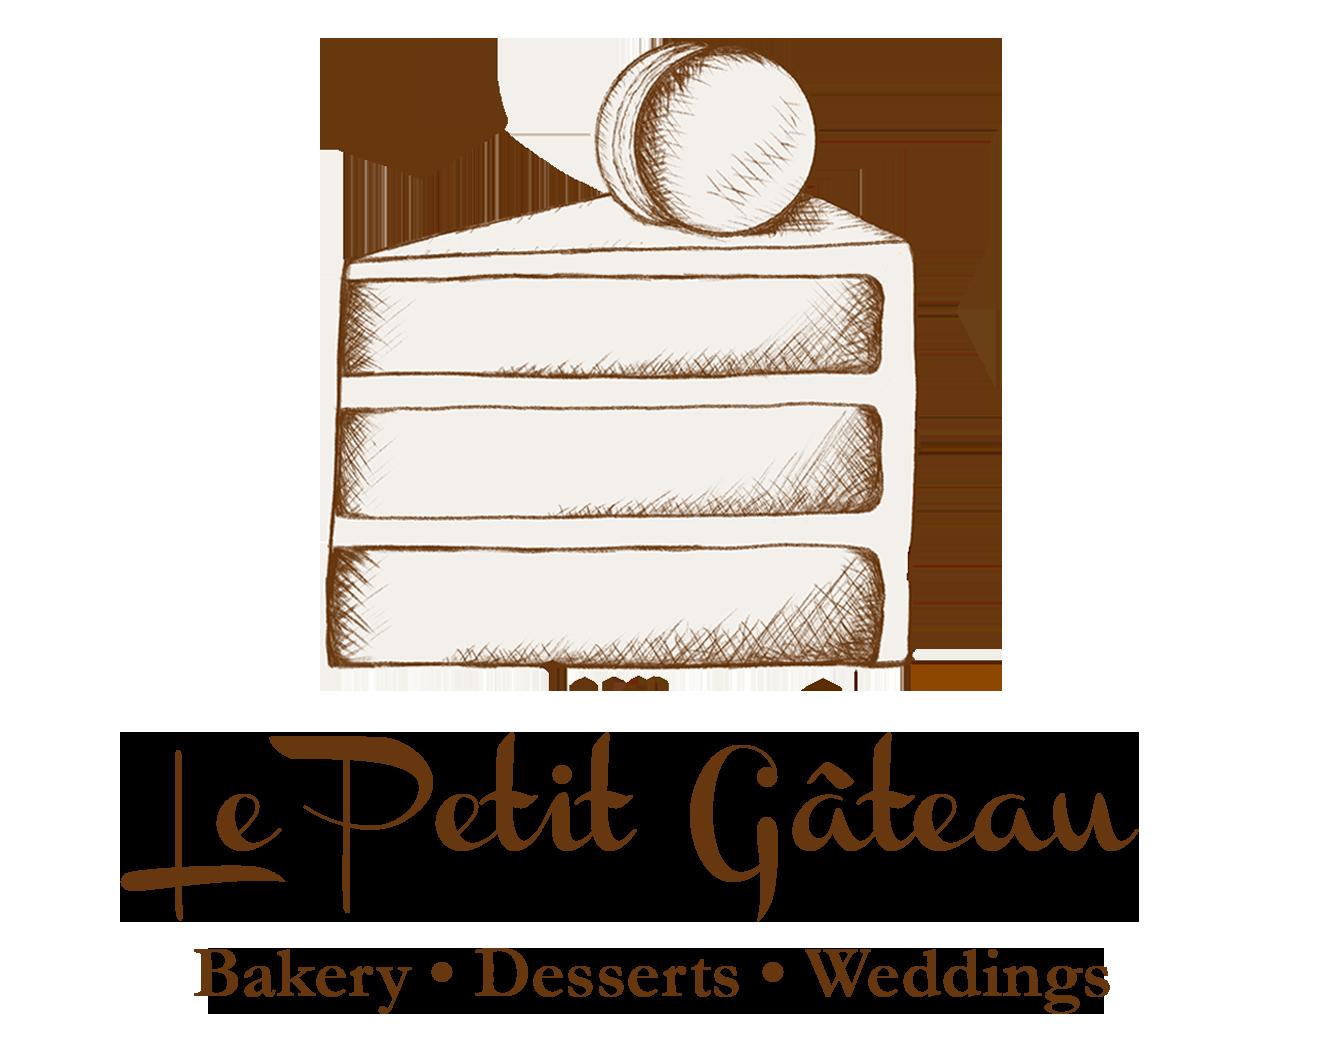 Le Petit Gâteau